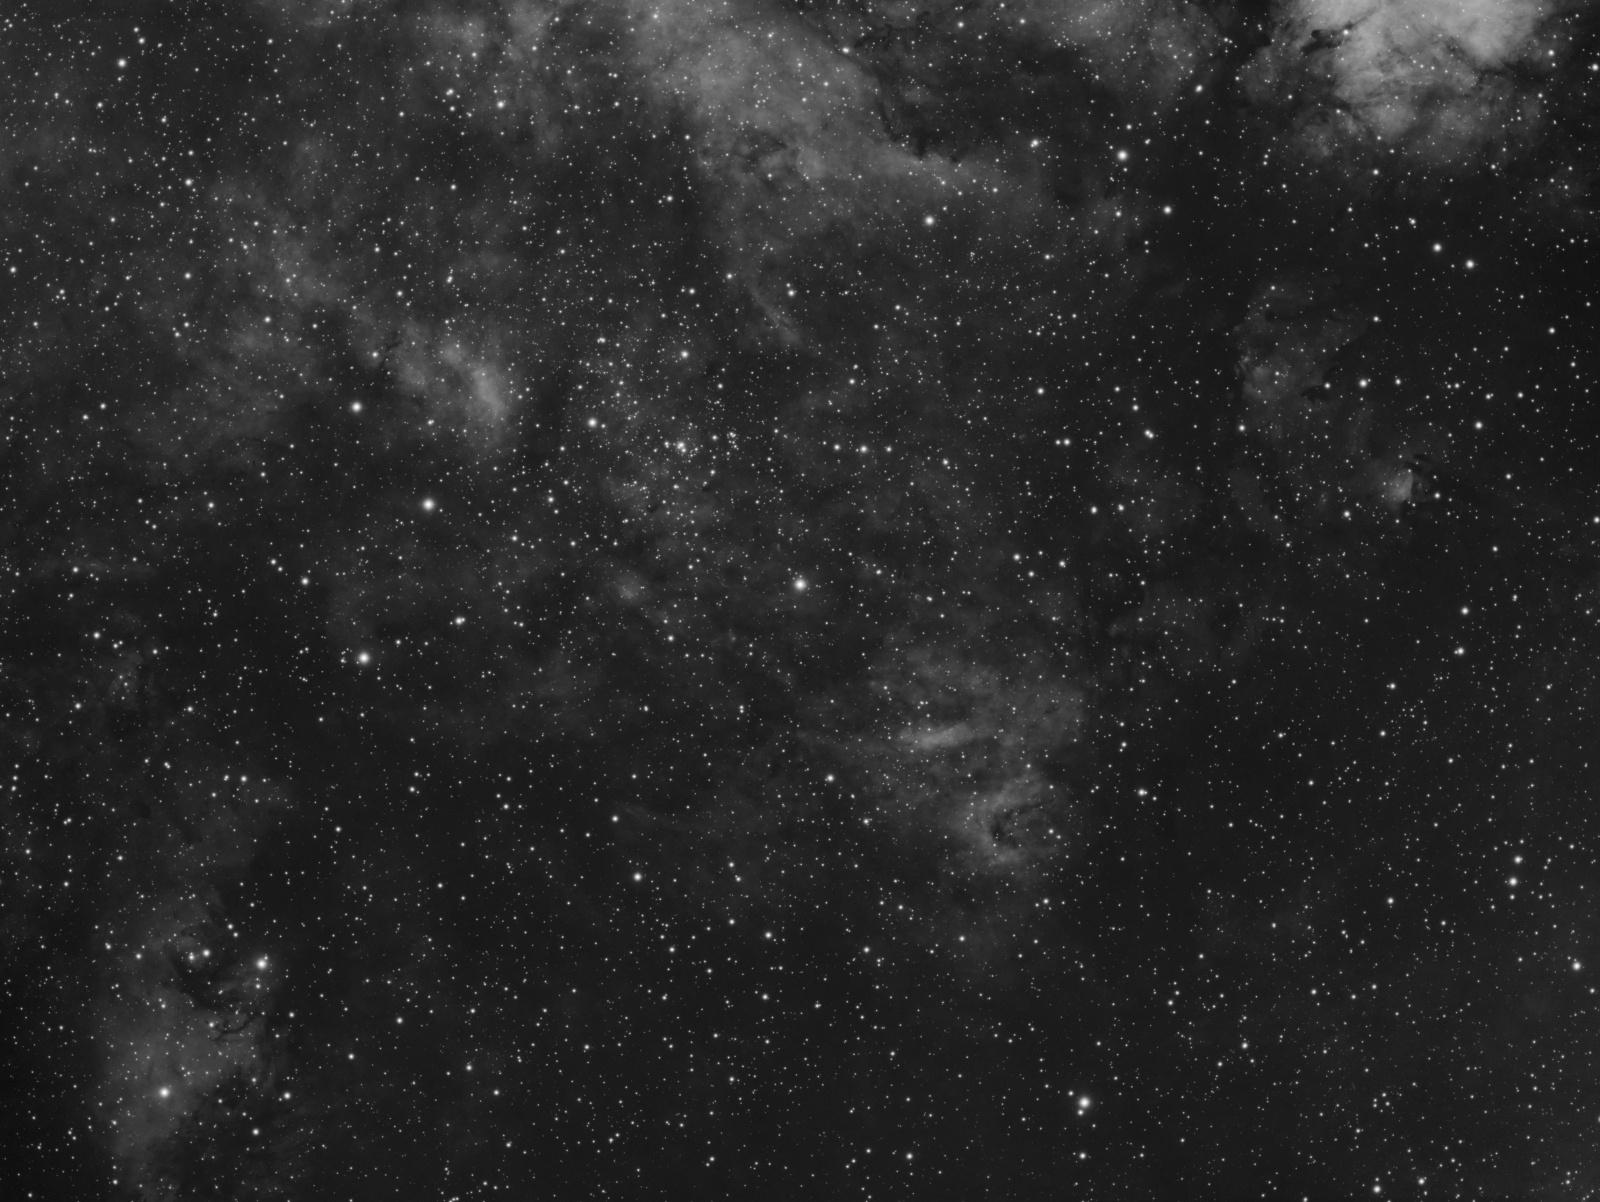 Cygnus_OB2_final_12h_stars.jpg